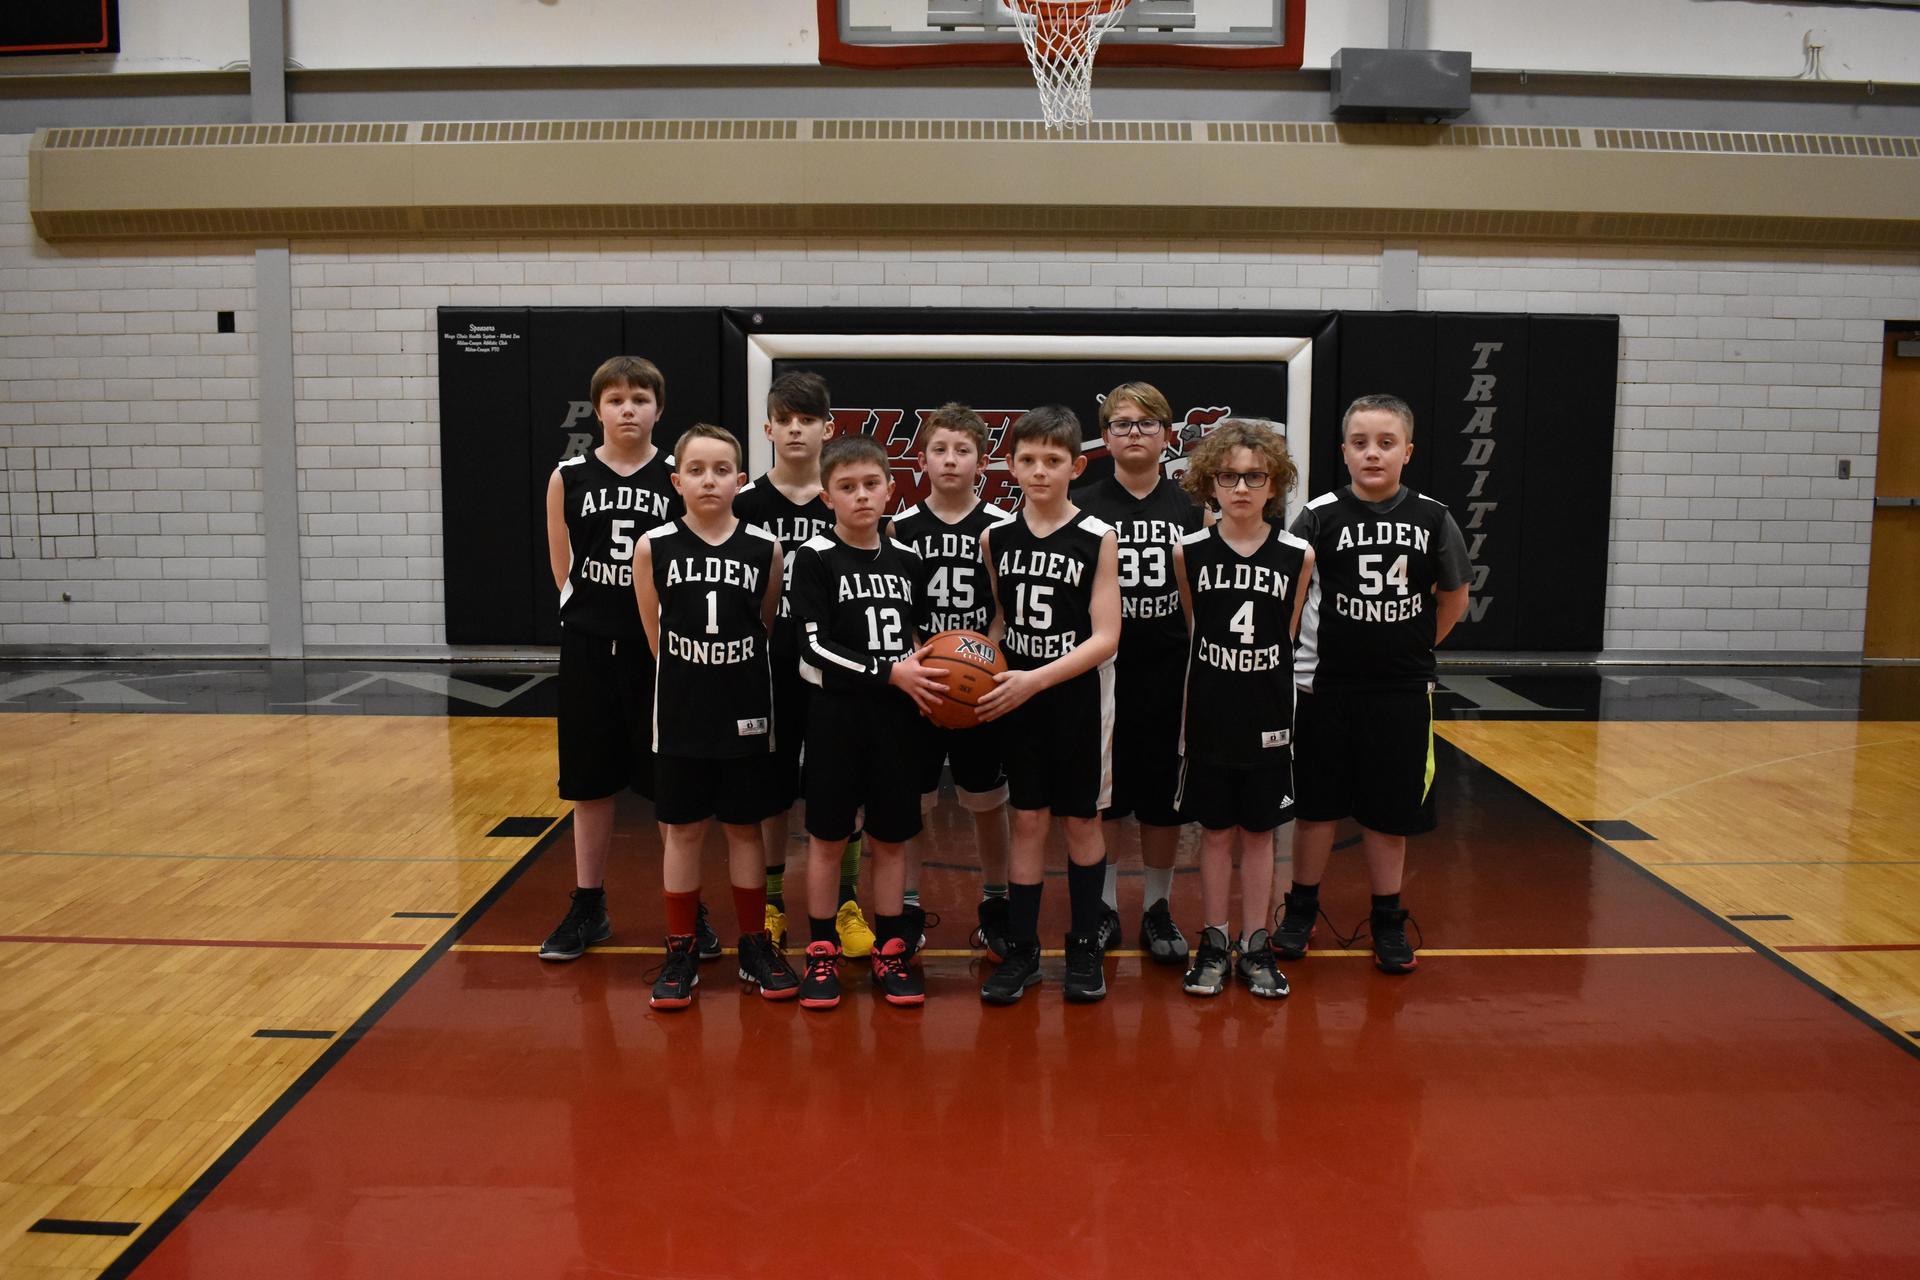 4th Grade Boys Basketball Team Photo